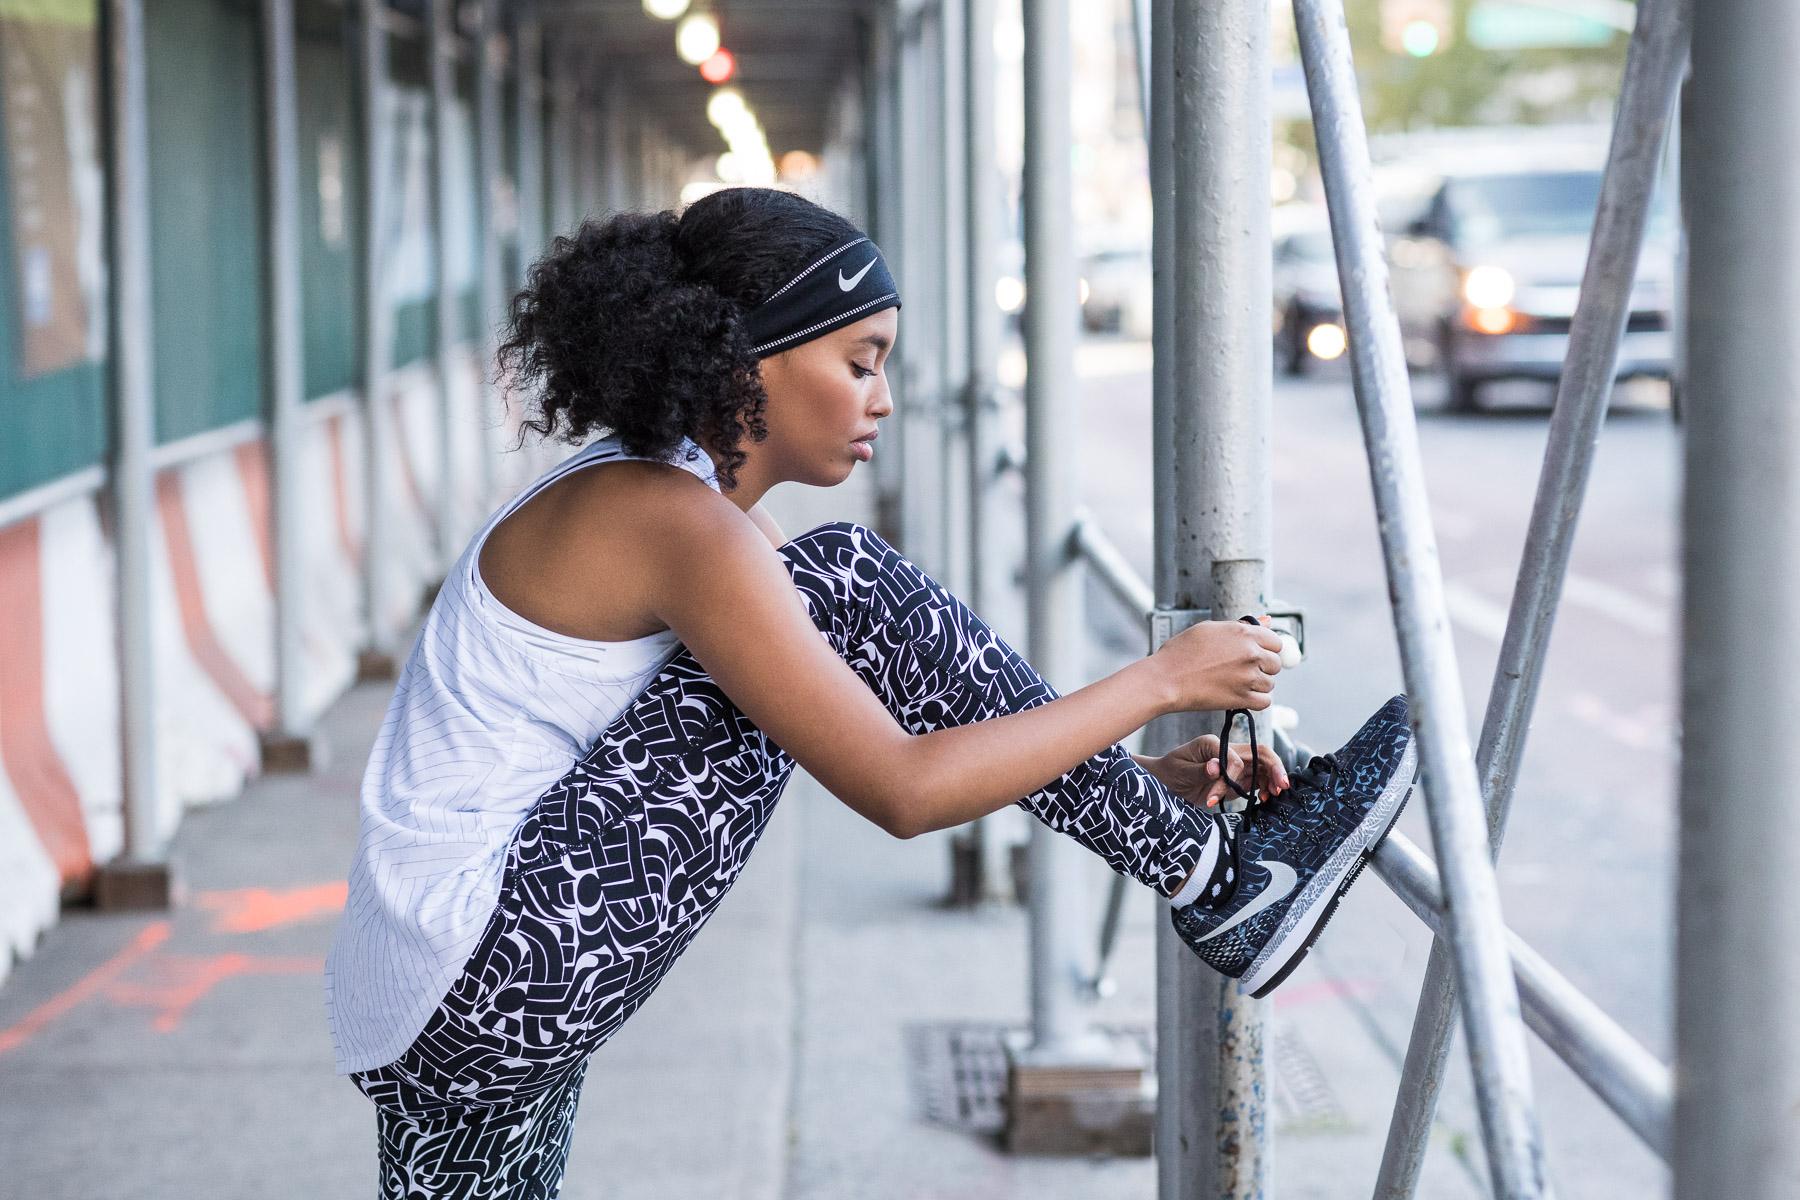 Ashley Barker Nike New York Shoes Sidewalk Construction Patterns Everyday PPL Tank top